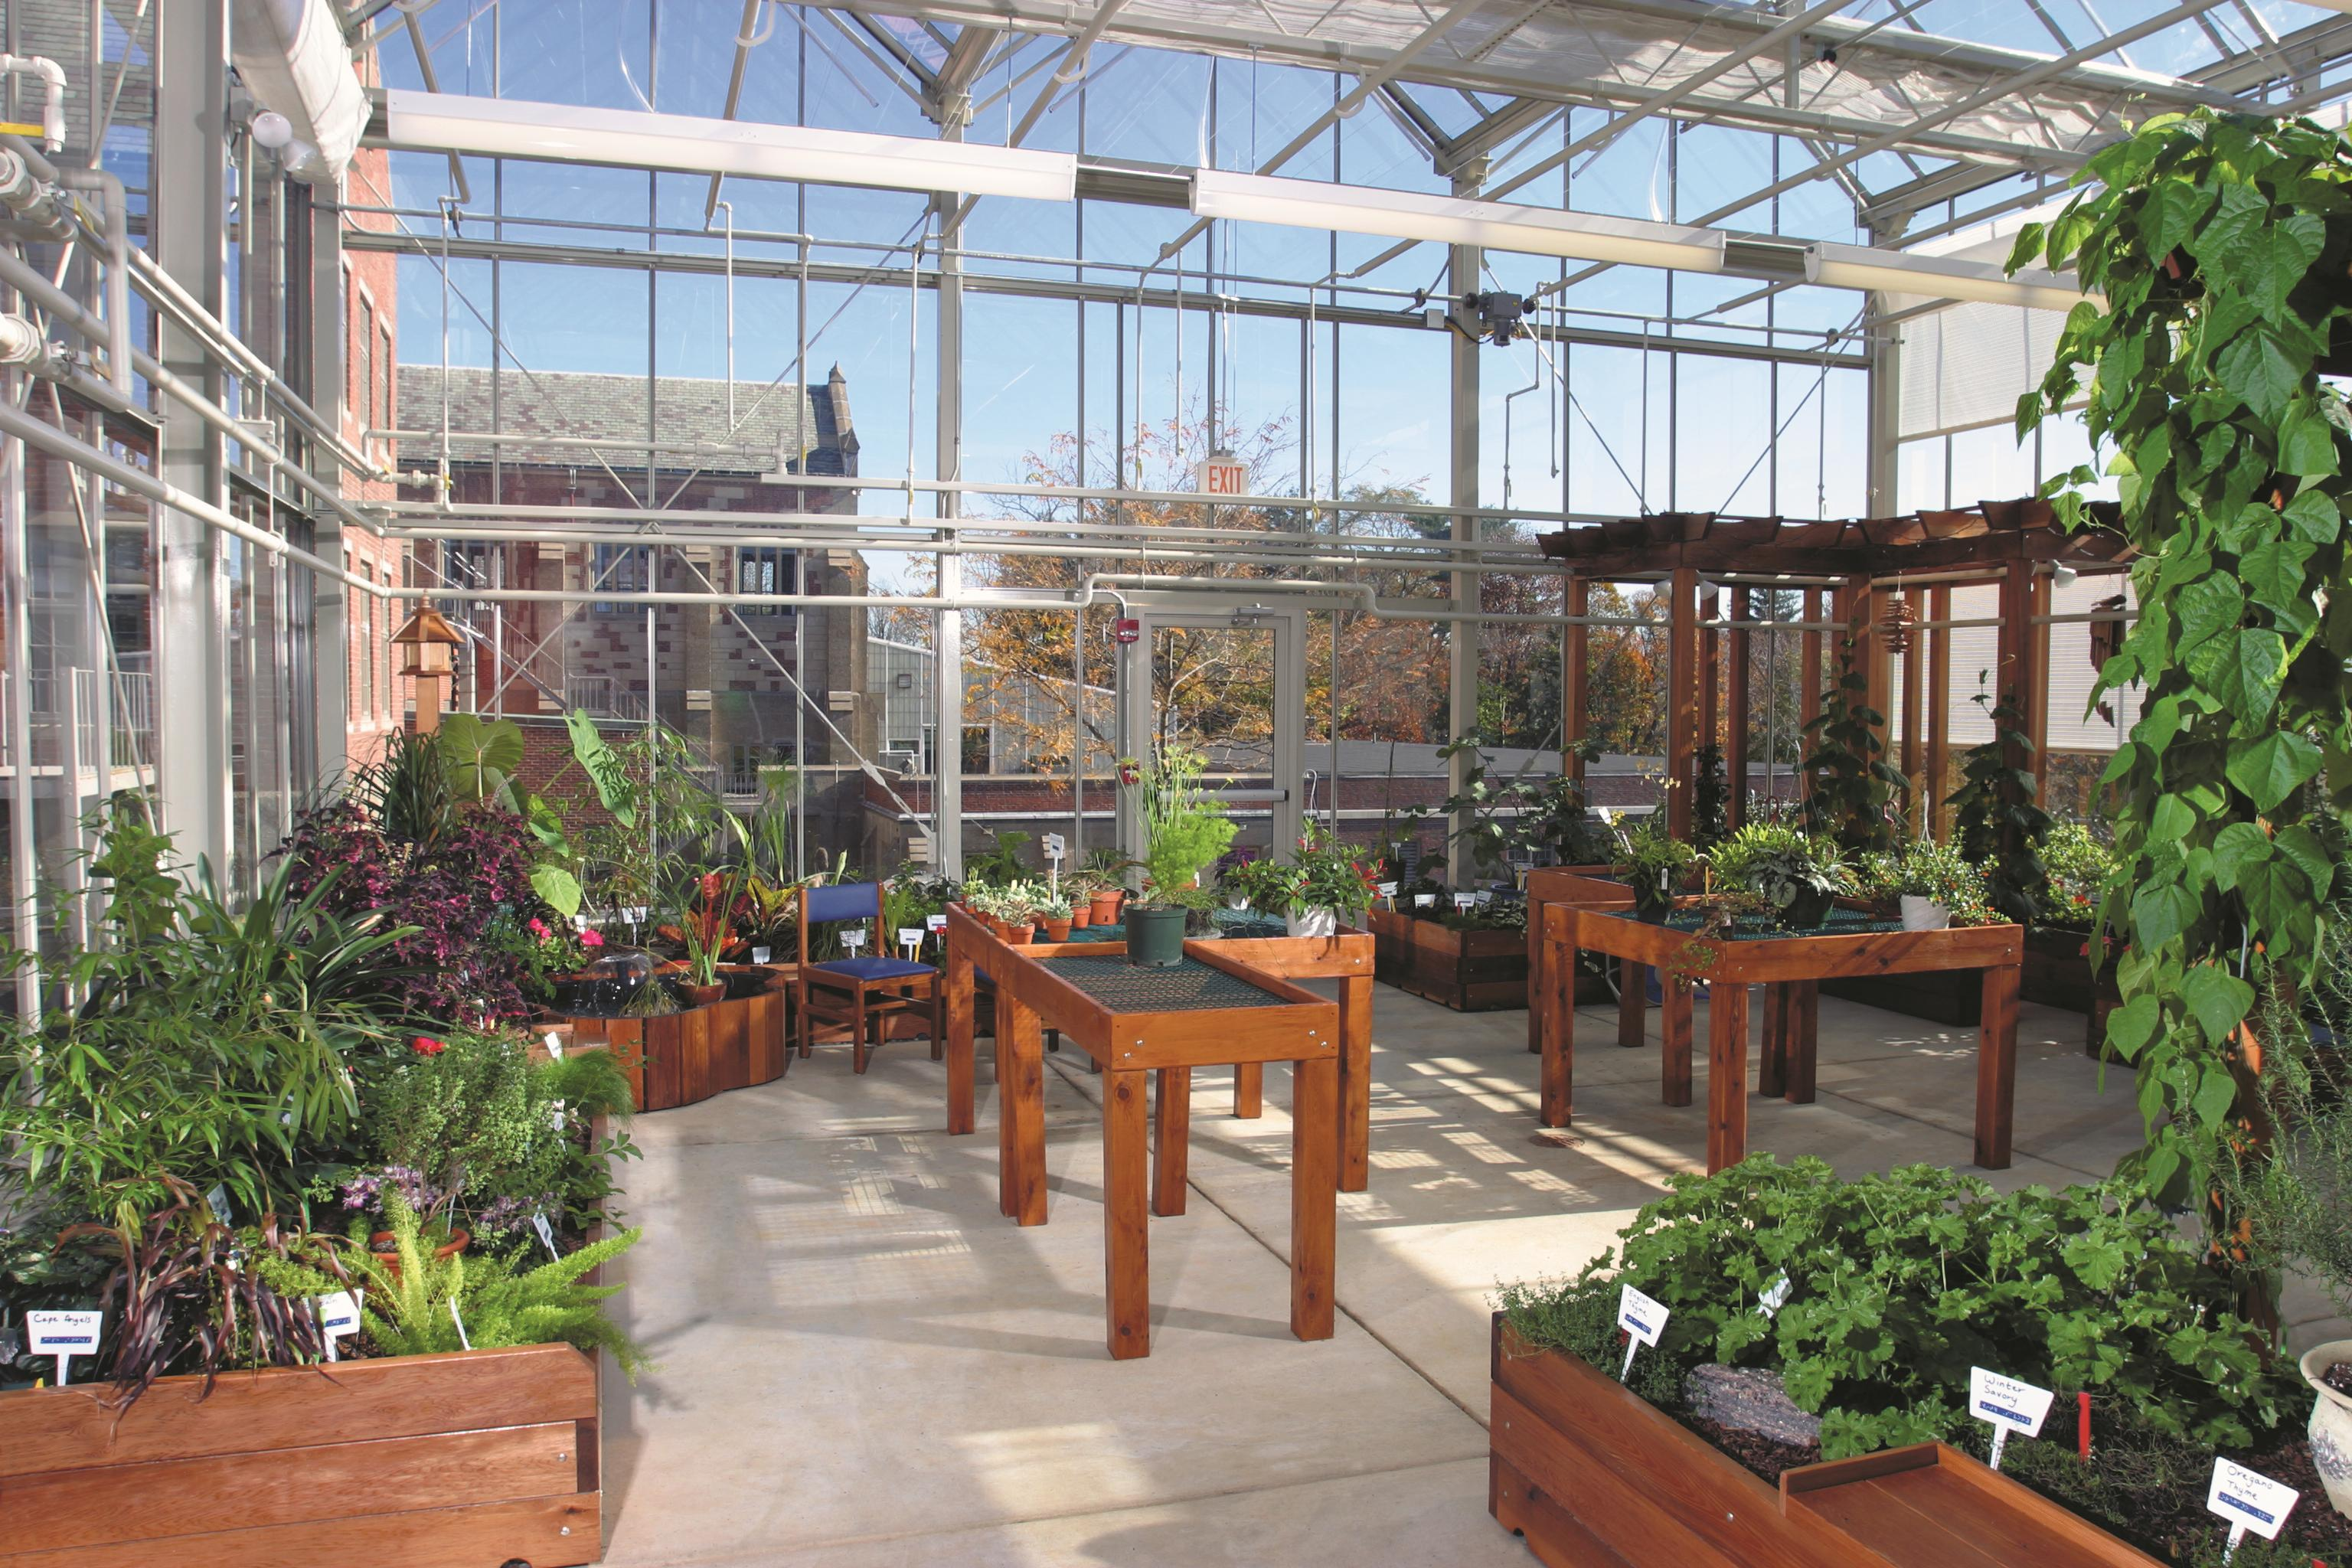 The greenhouse richardson - The Greenhouse Richardson 43